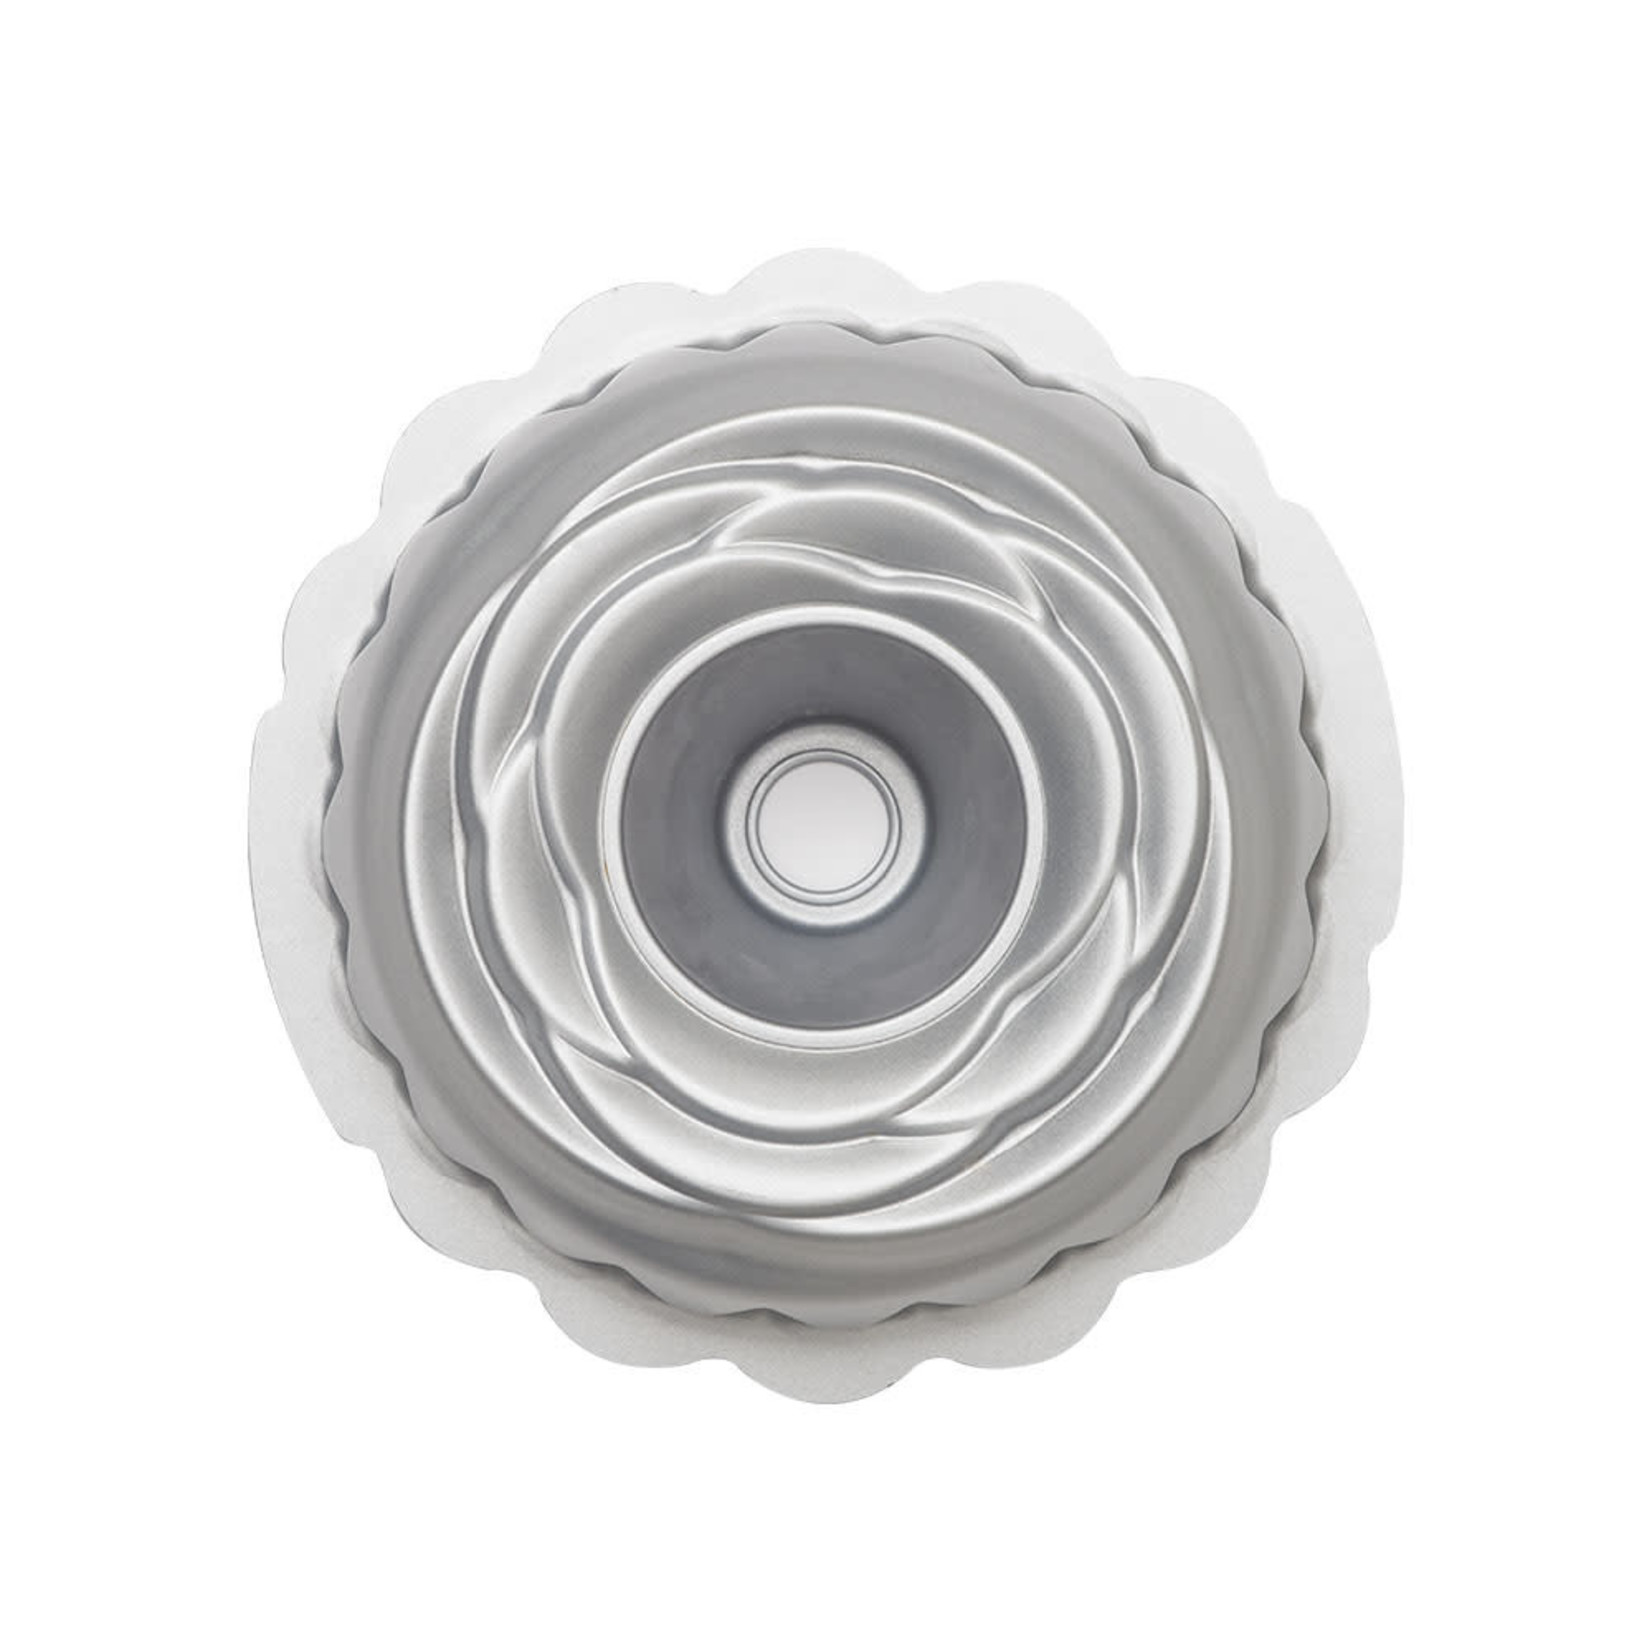 Decora bakvorm roos 20cm met antikleeflaag